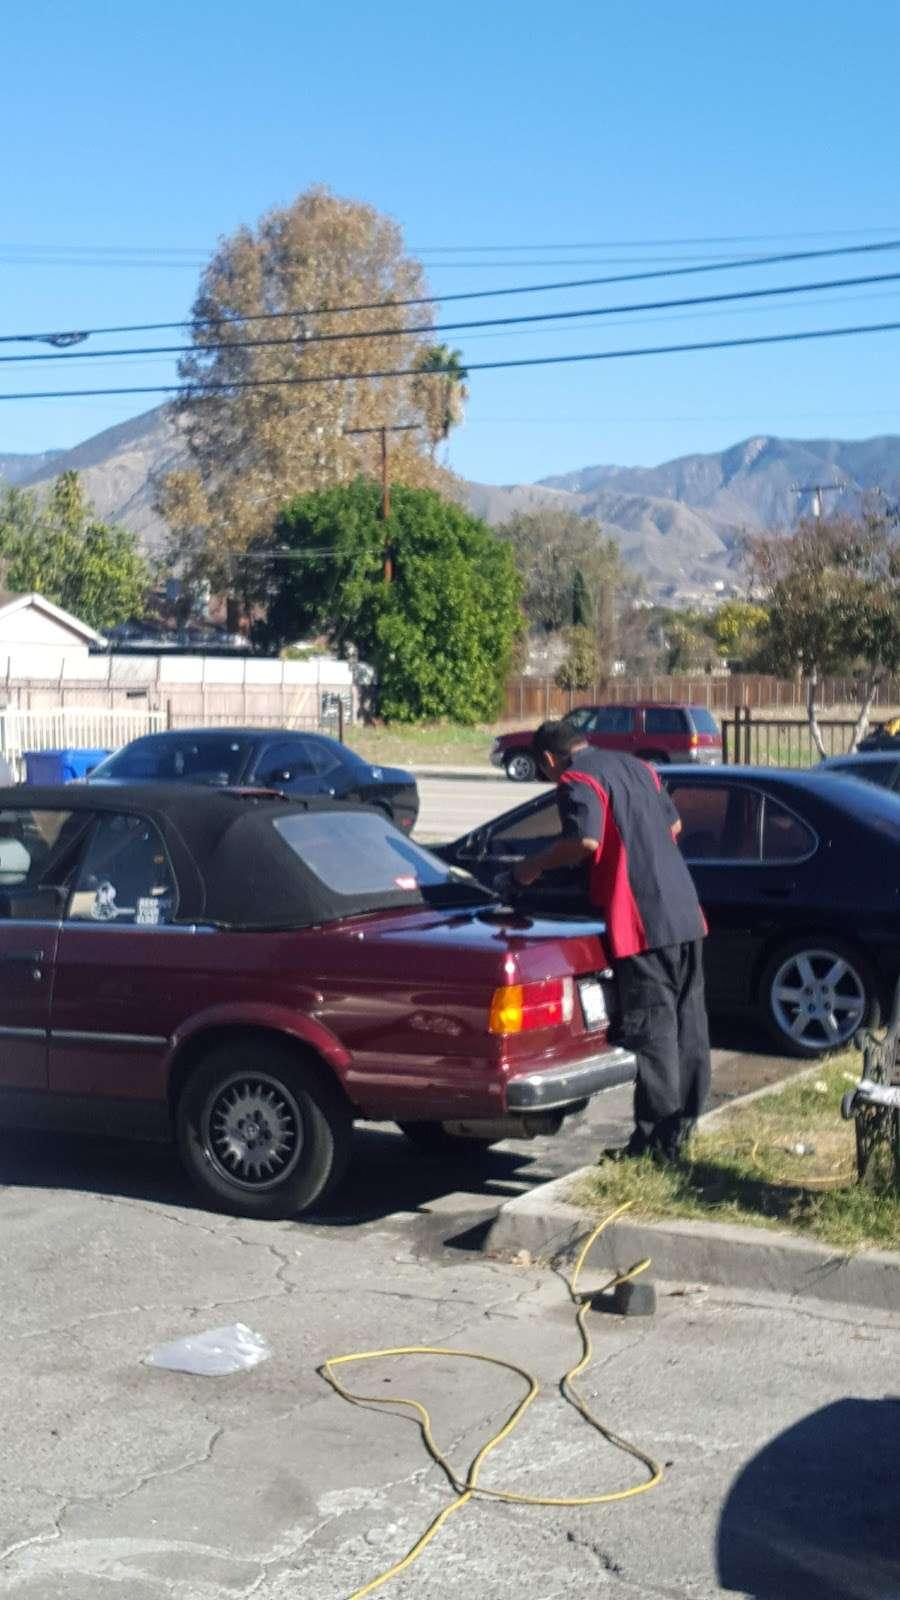 Gabis Auto Repair & Body Shop - car repair    Photo 3 of 4   Address: 2228 N Golden Ave, San Bernardino, CA 92404, USA   Phone: (909) 883-8591